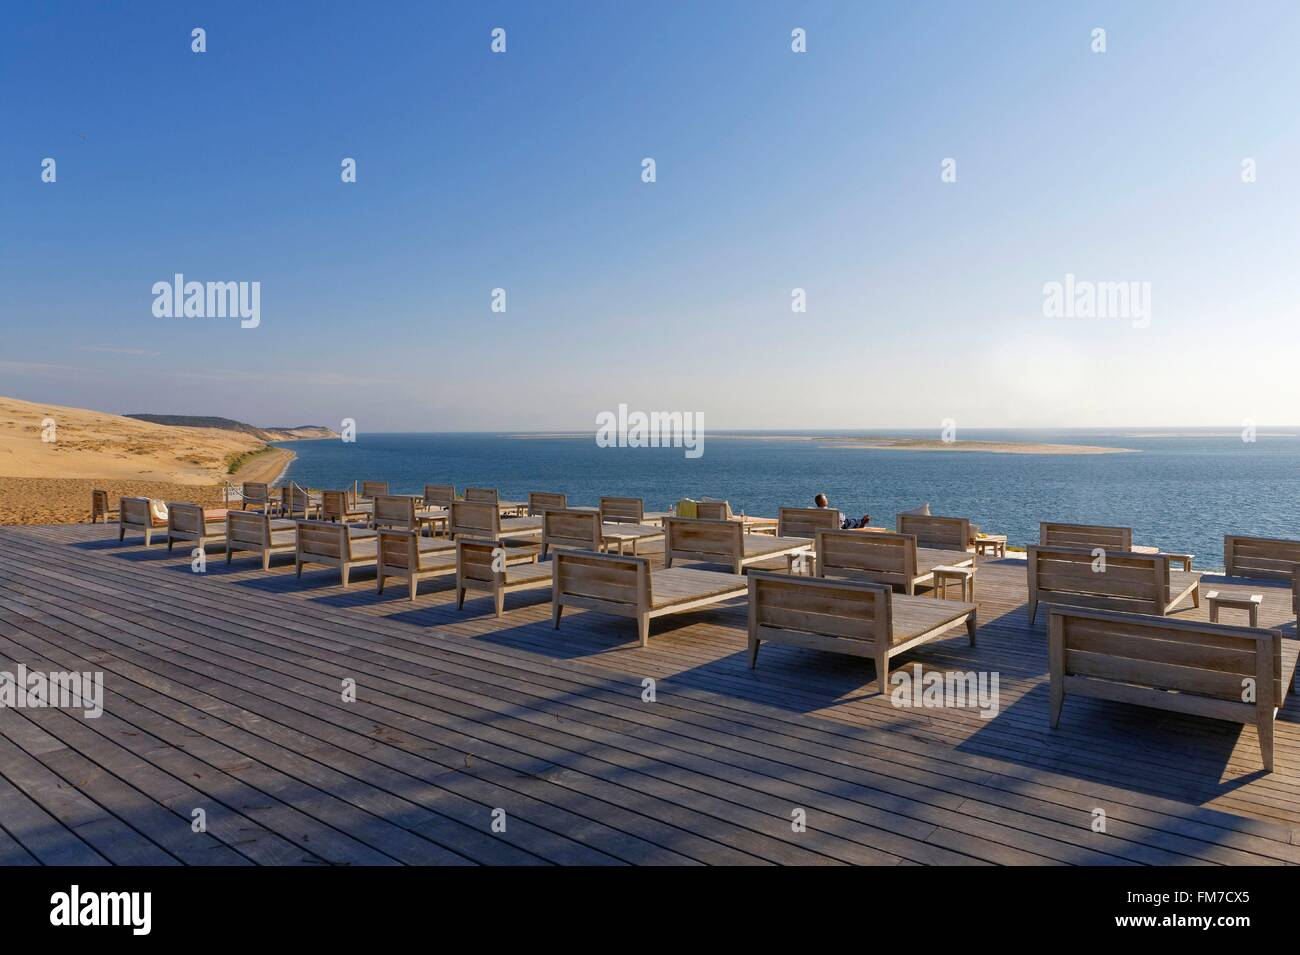 france gironde bassin d 39 arcachon pyla sur mer la corniche hotel stock photo royalty free. Black Bedroom Furniture Sets. Home Design Ideas